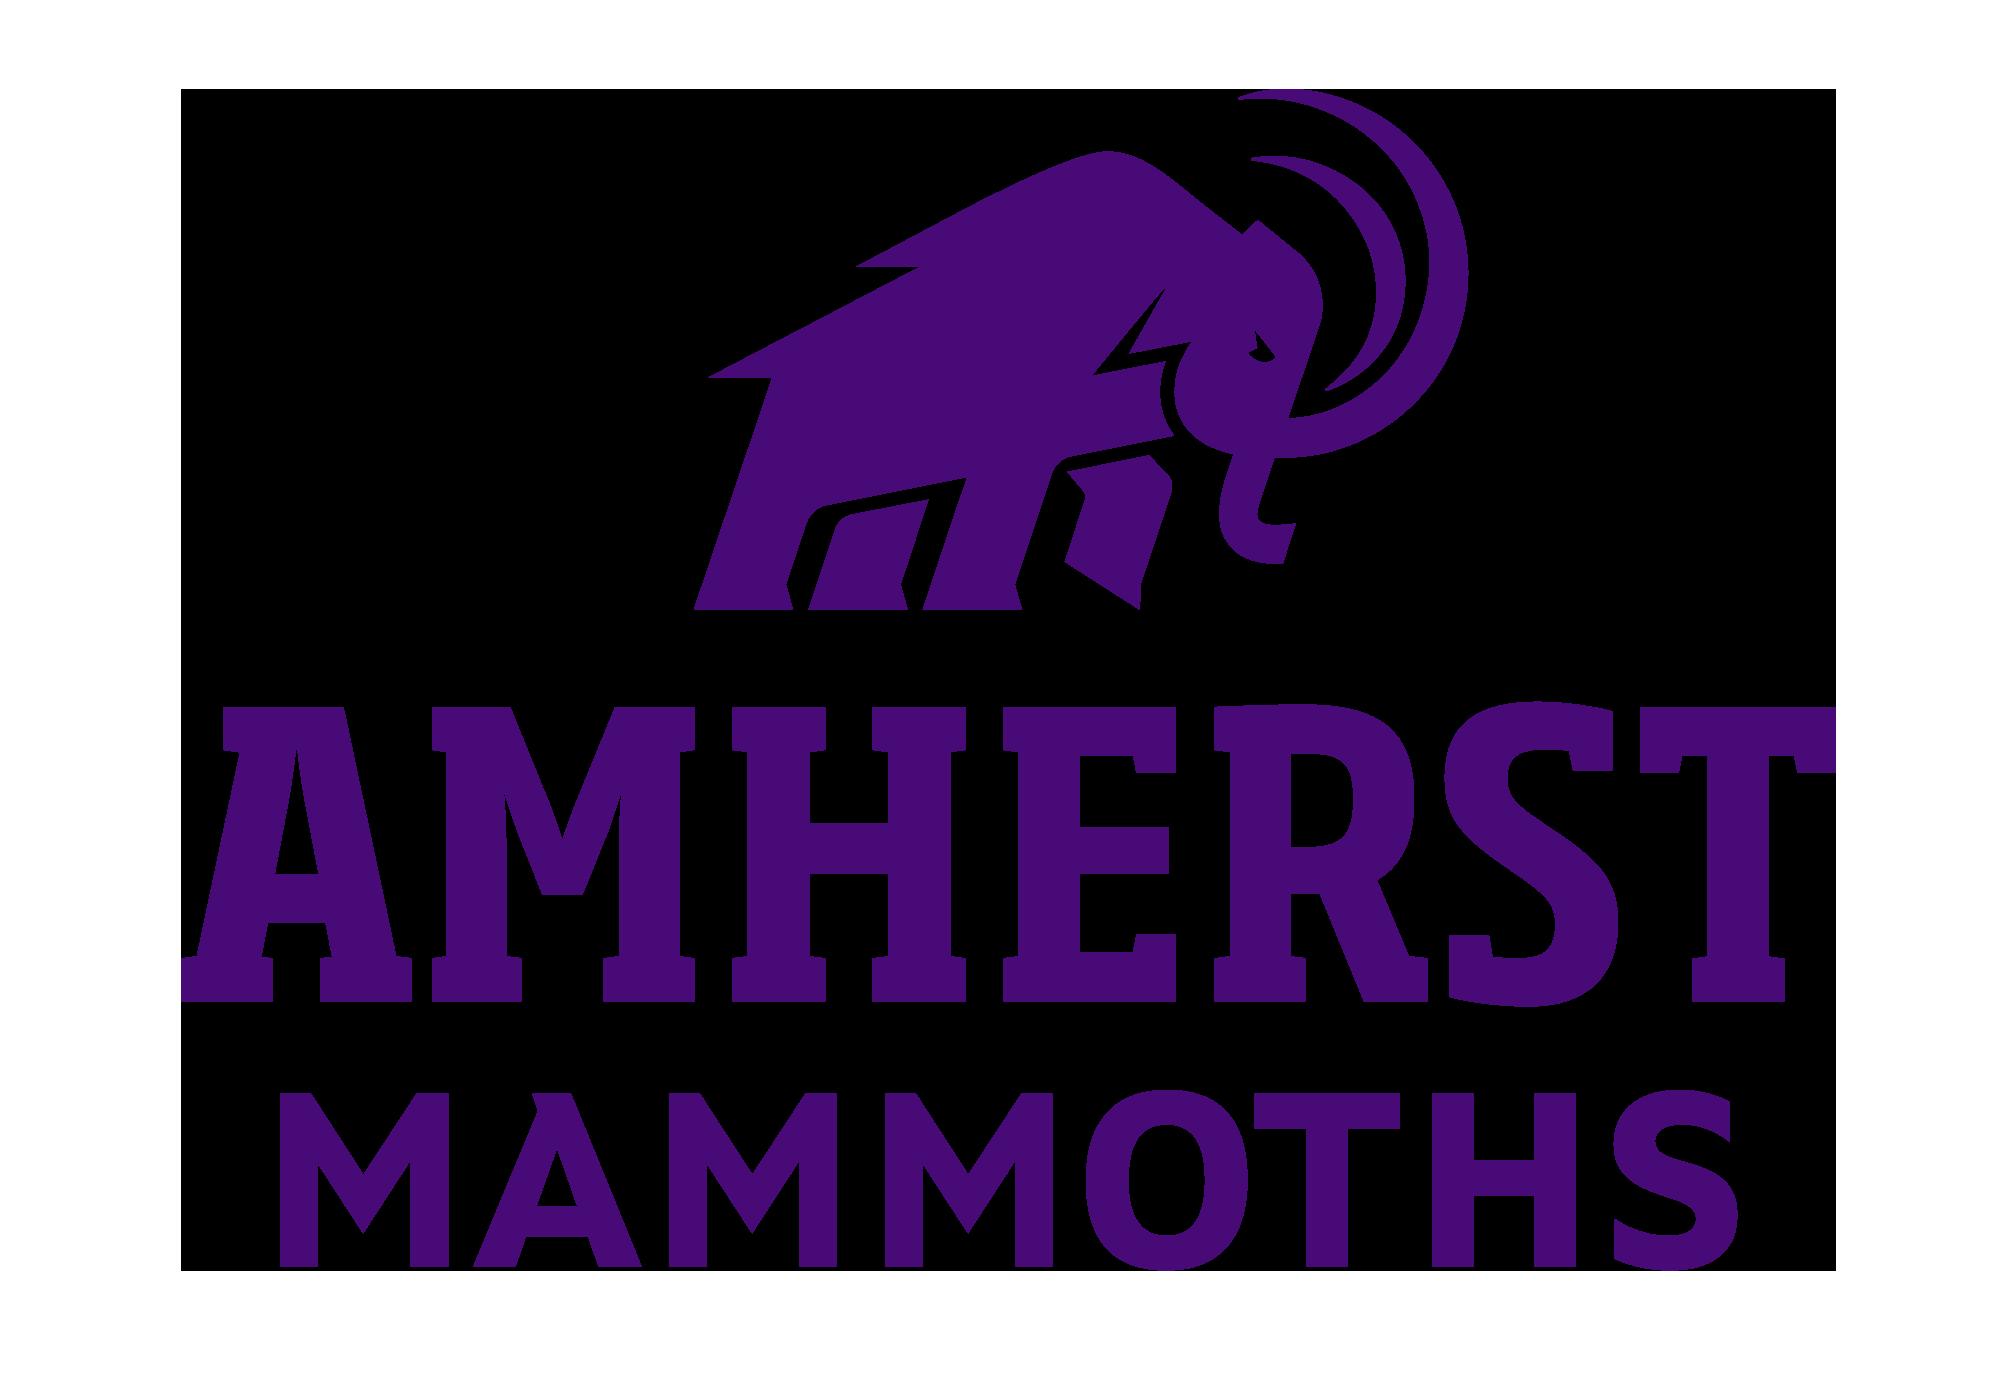 Mammoth logo with caption Amherst Mammoths